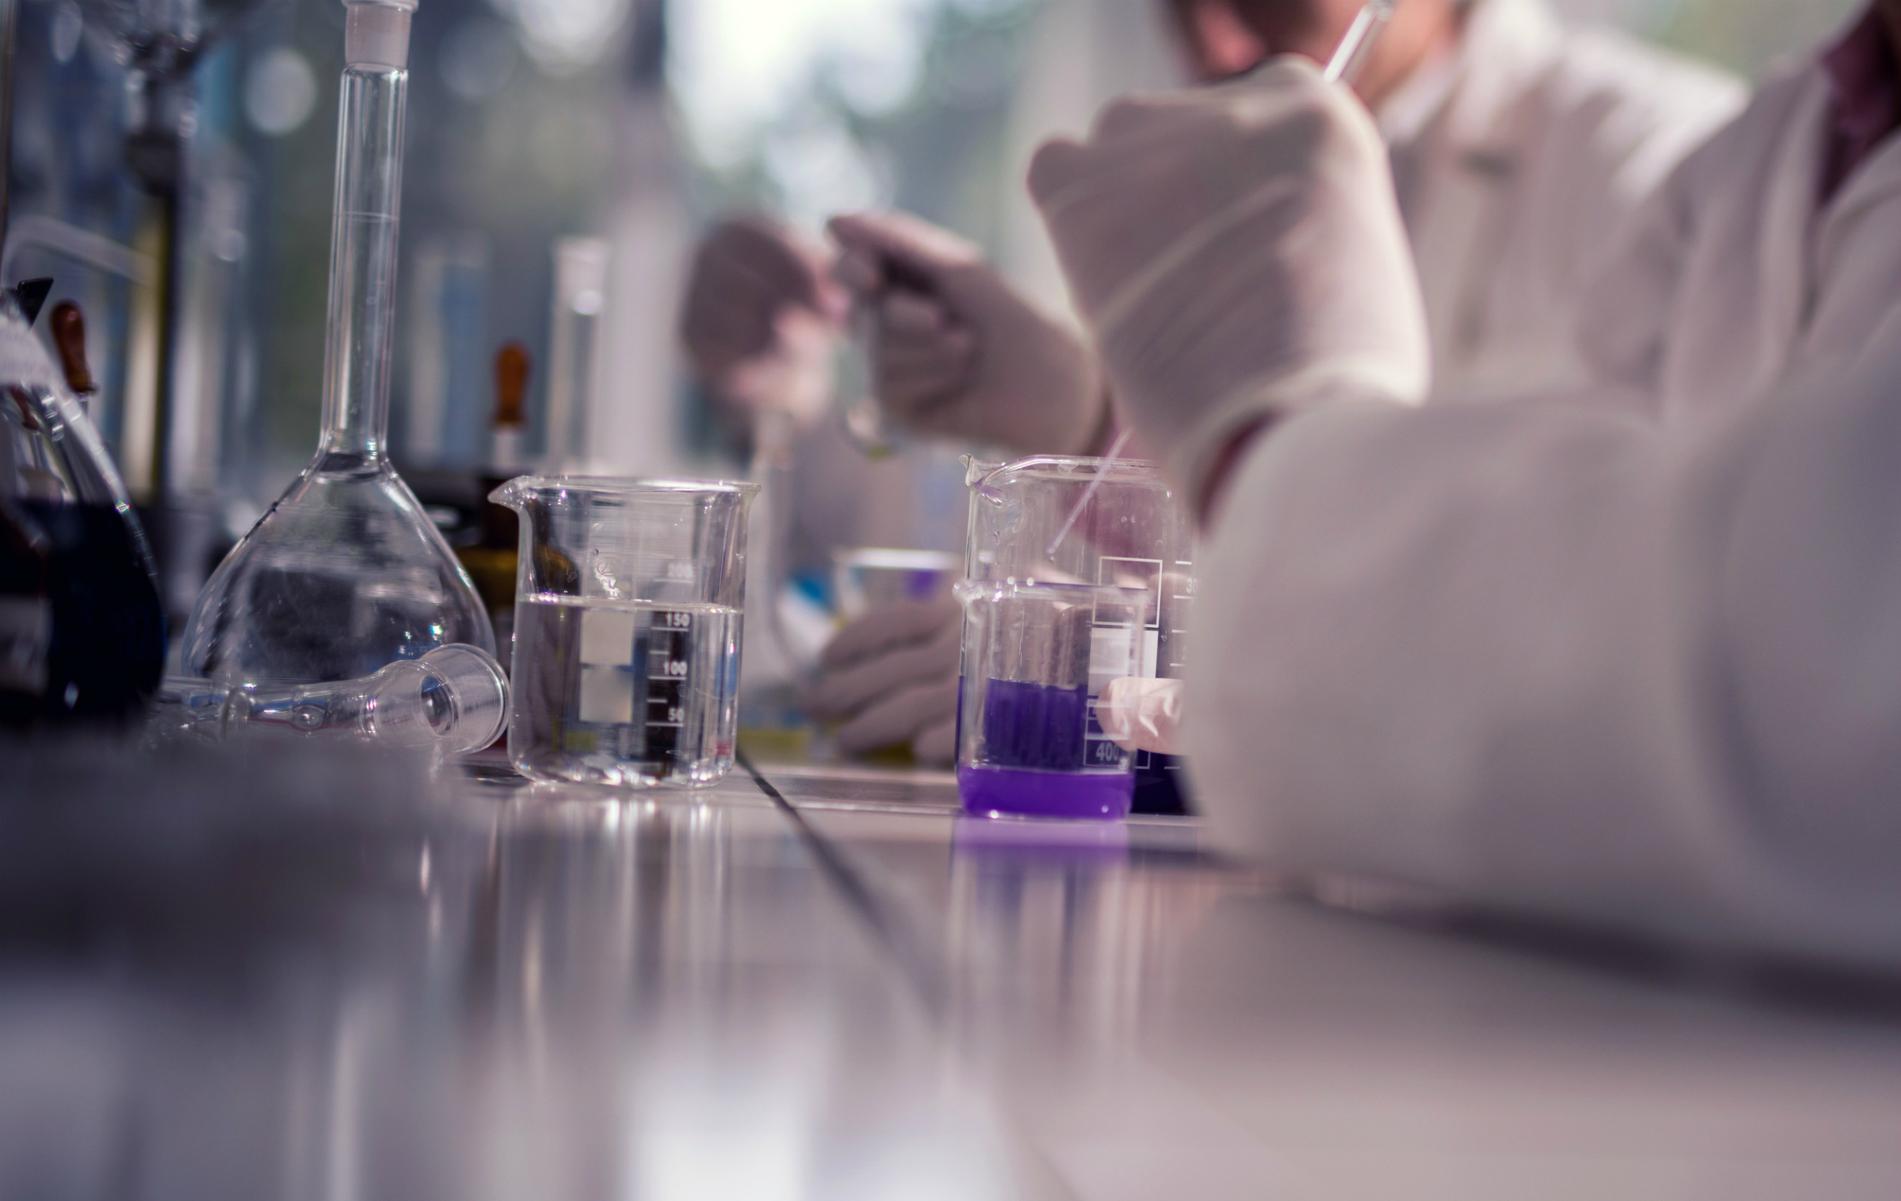 Meet Lumir Hanus, Who Discovered the First Endocannabinoid | Leafly